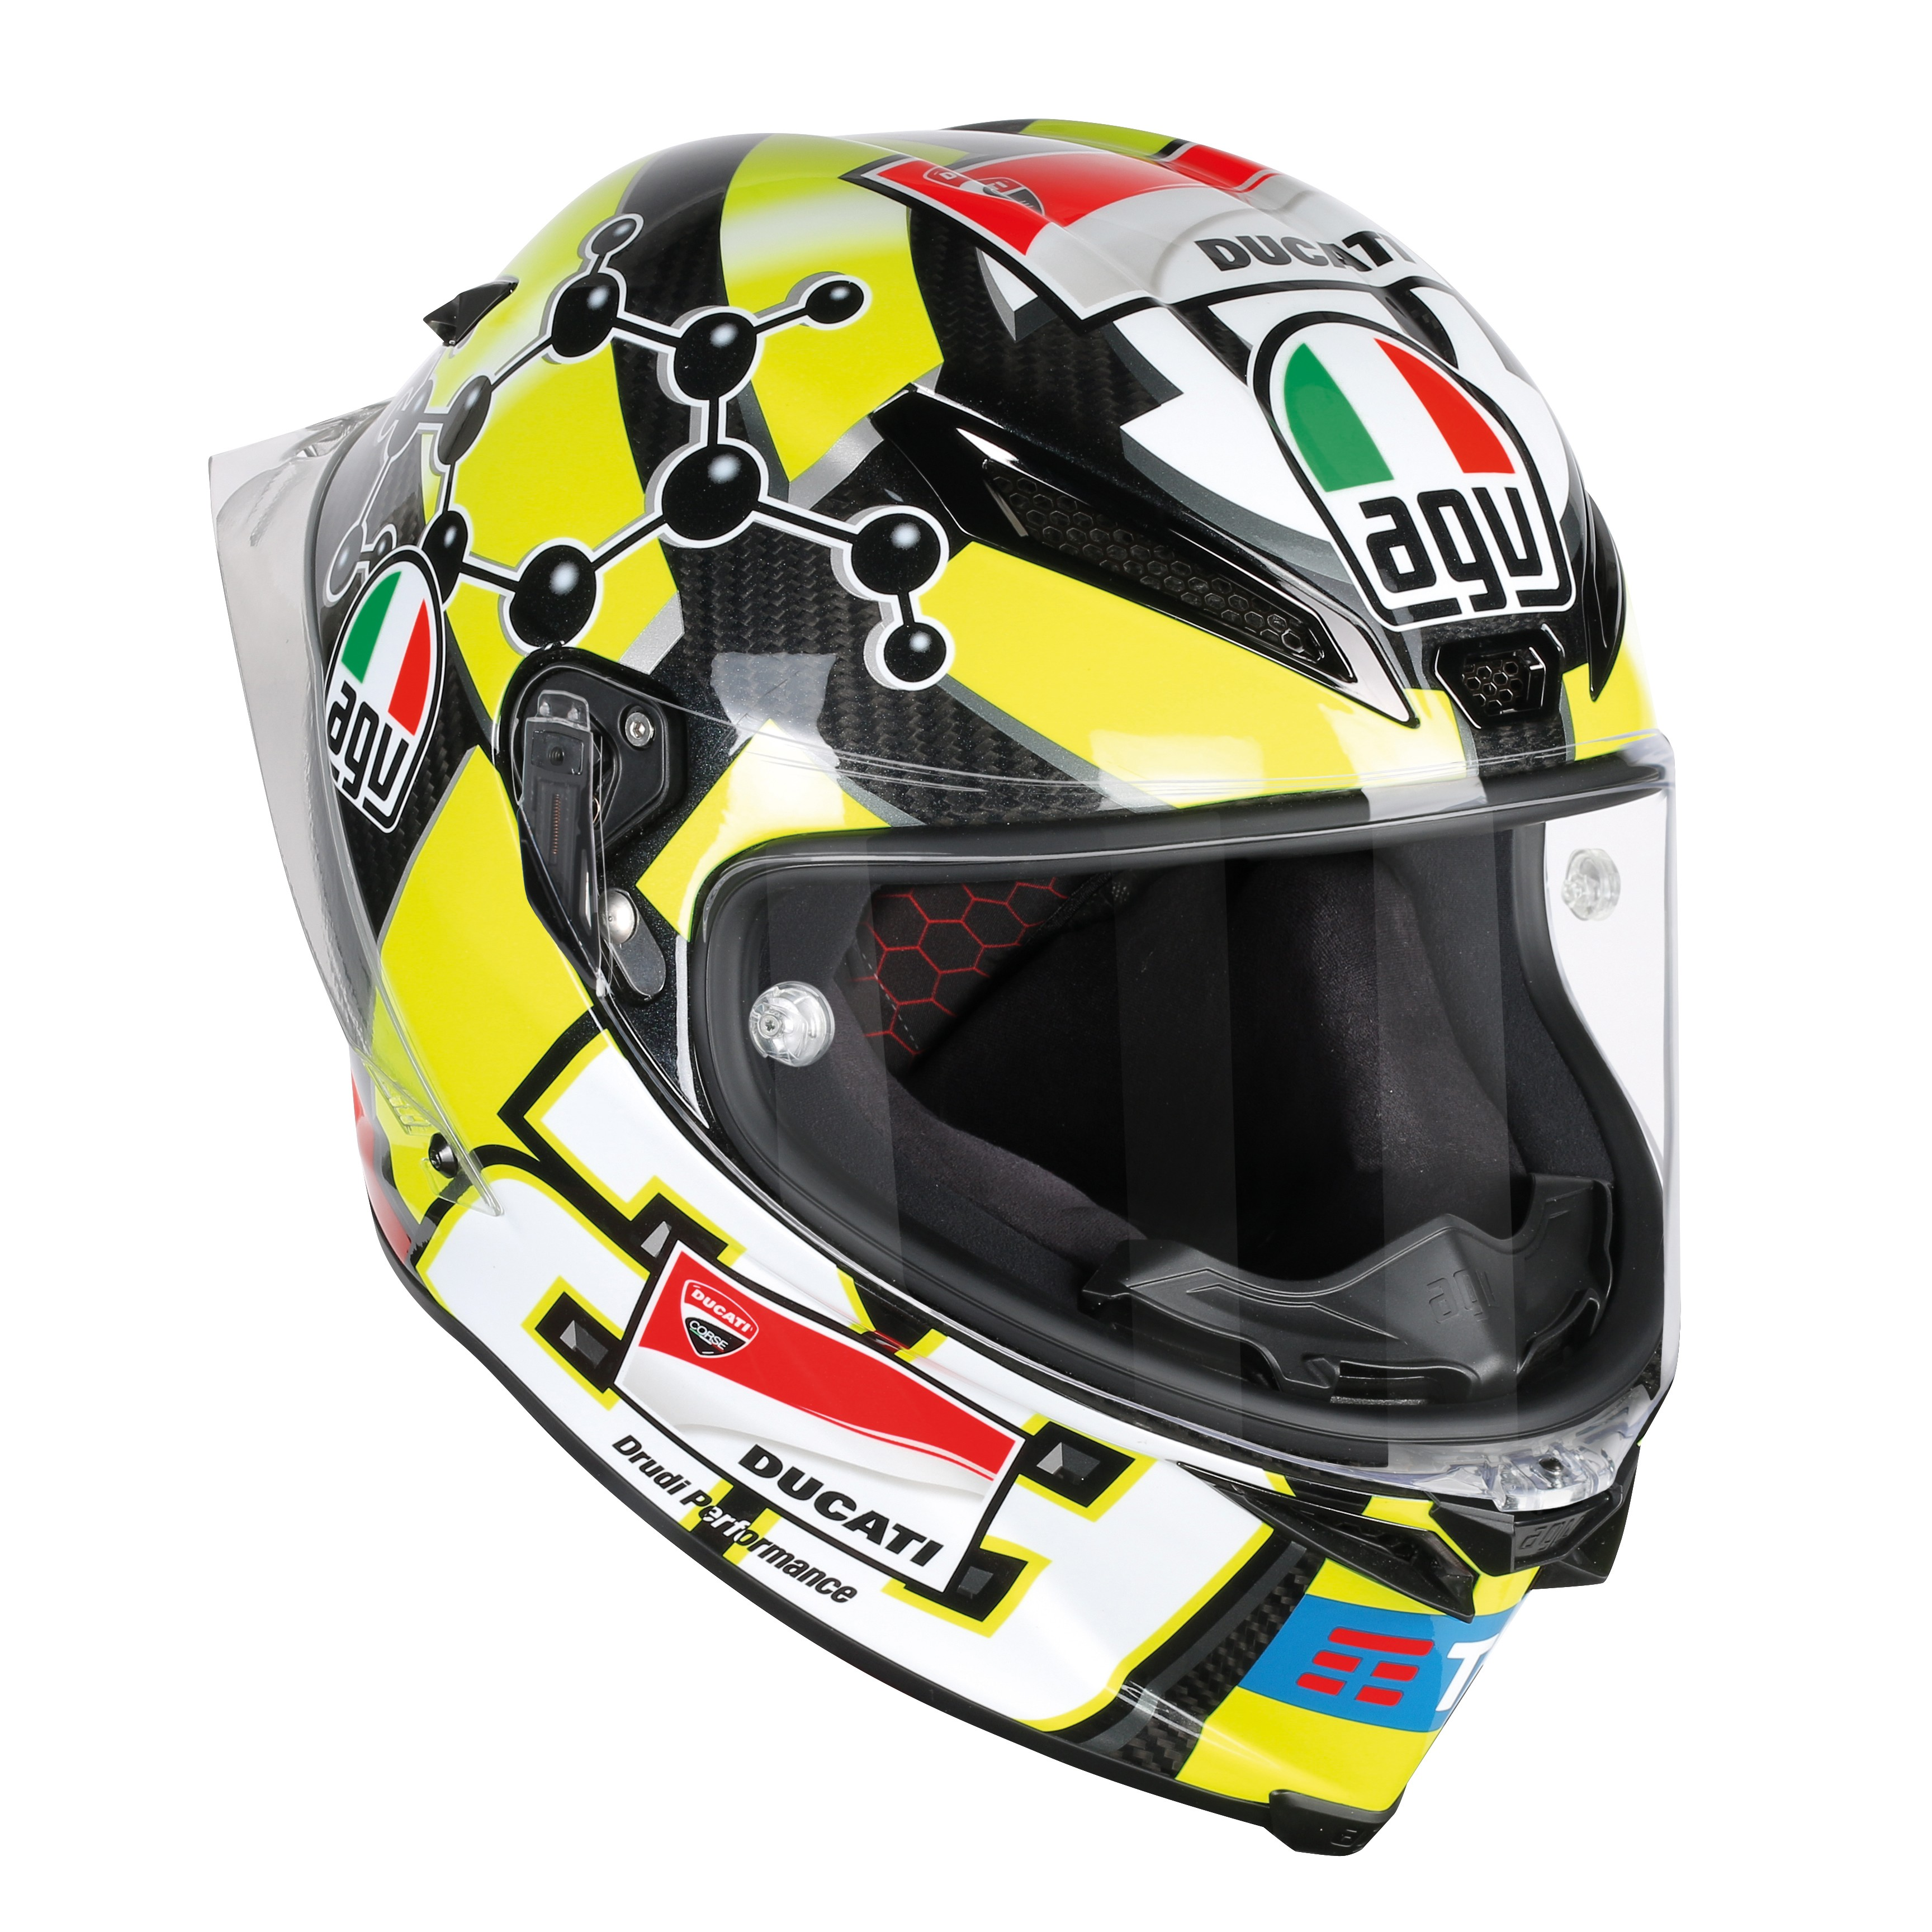 AGV Pista GP-R Ianonne 2016